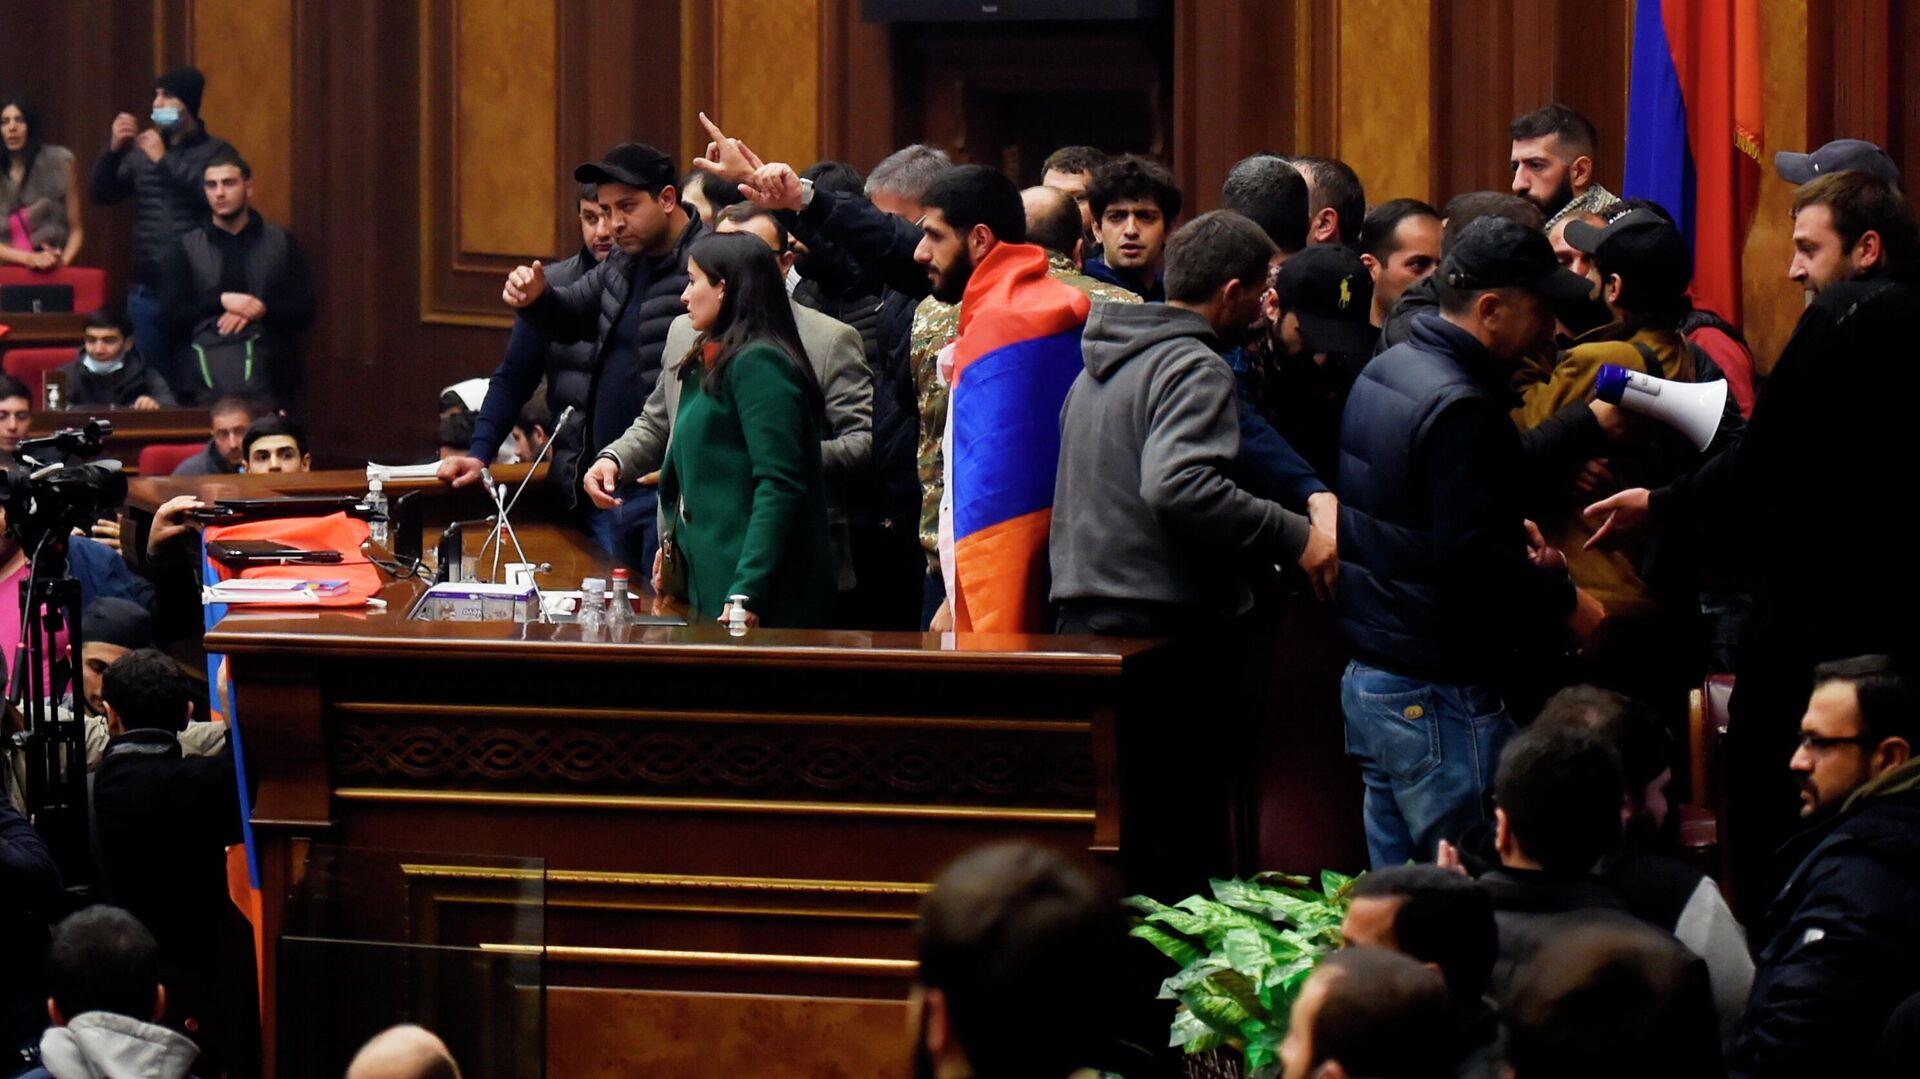 Участники акции протеста в одном из залов в здании парламента Армении в Ереване - РИА Новости, 1920, 12.11.2020